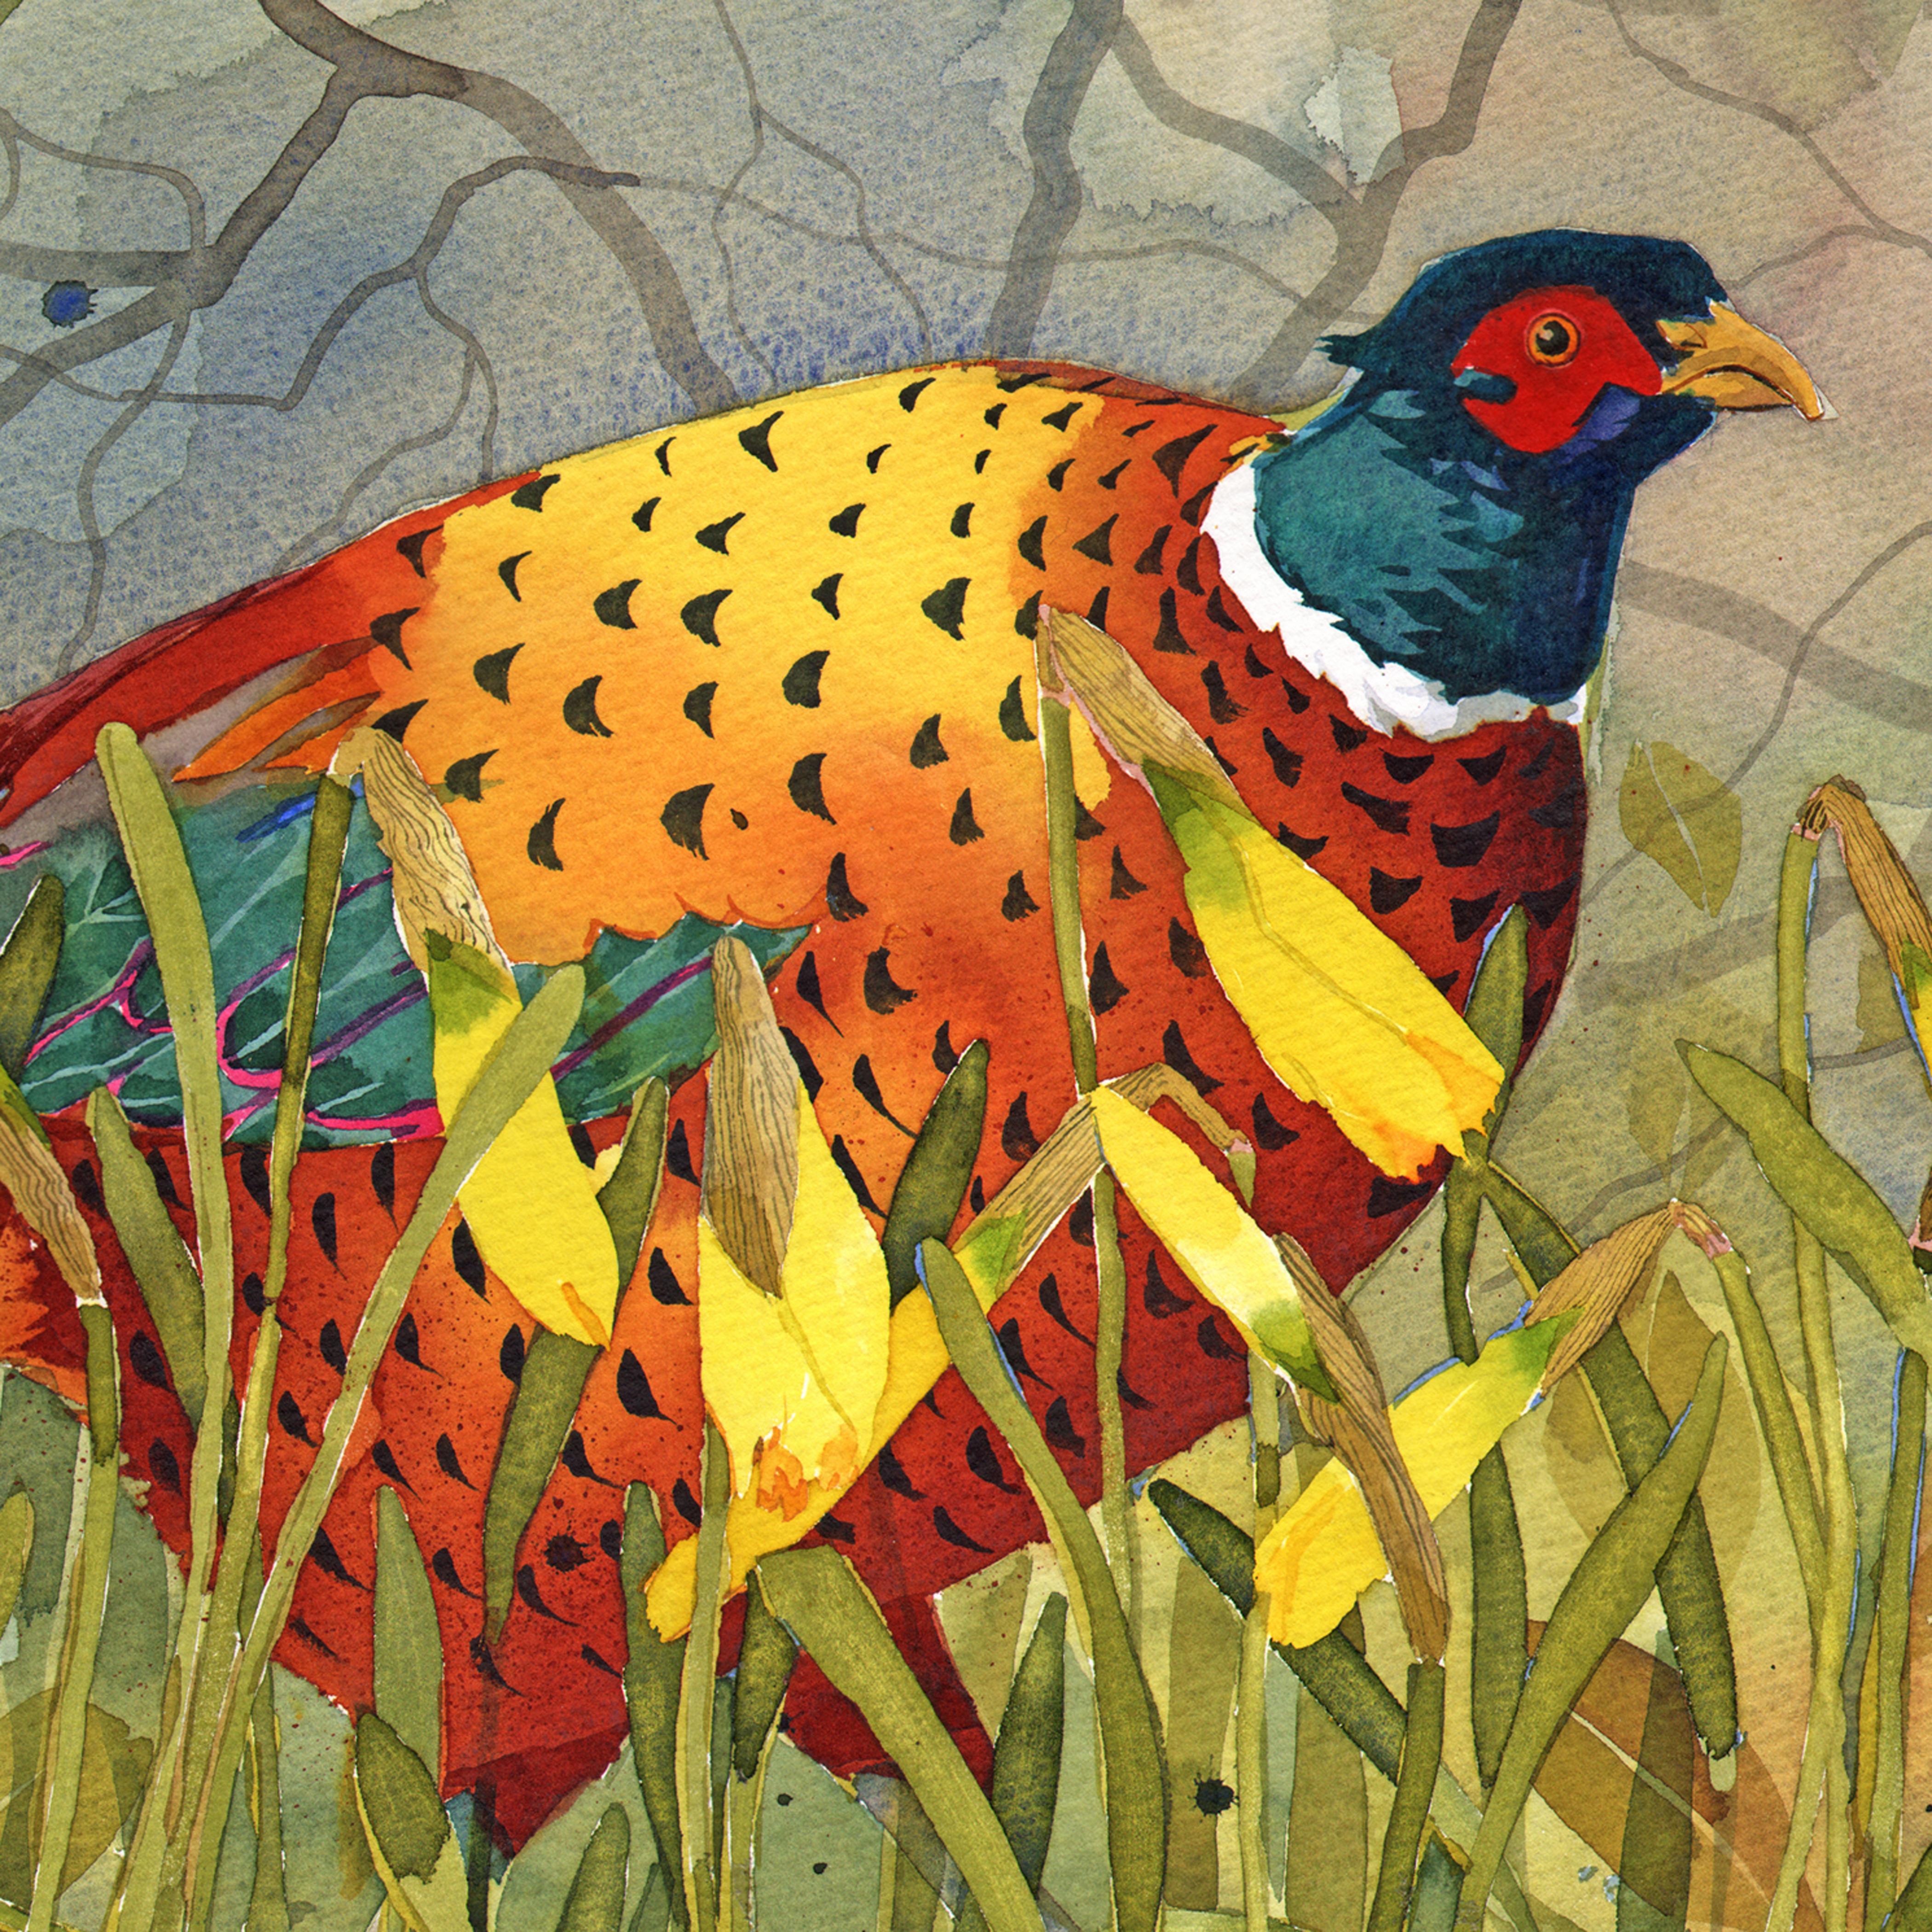 Pheasant, daffodils Q60 image